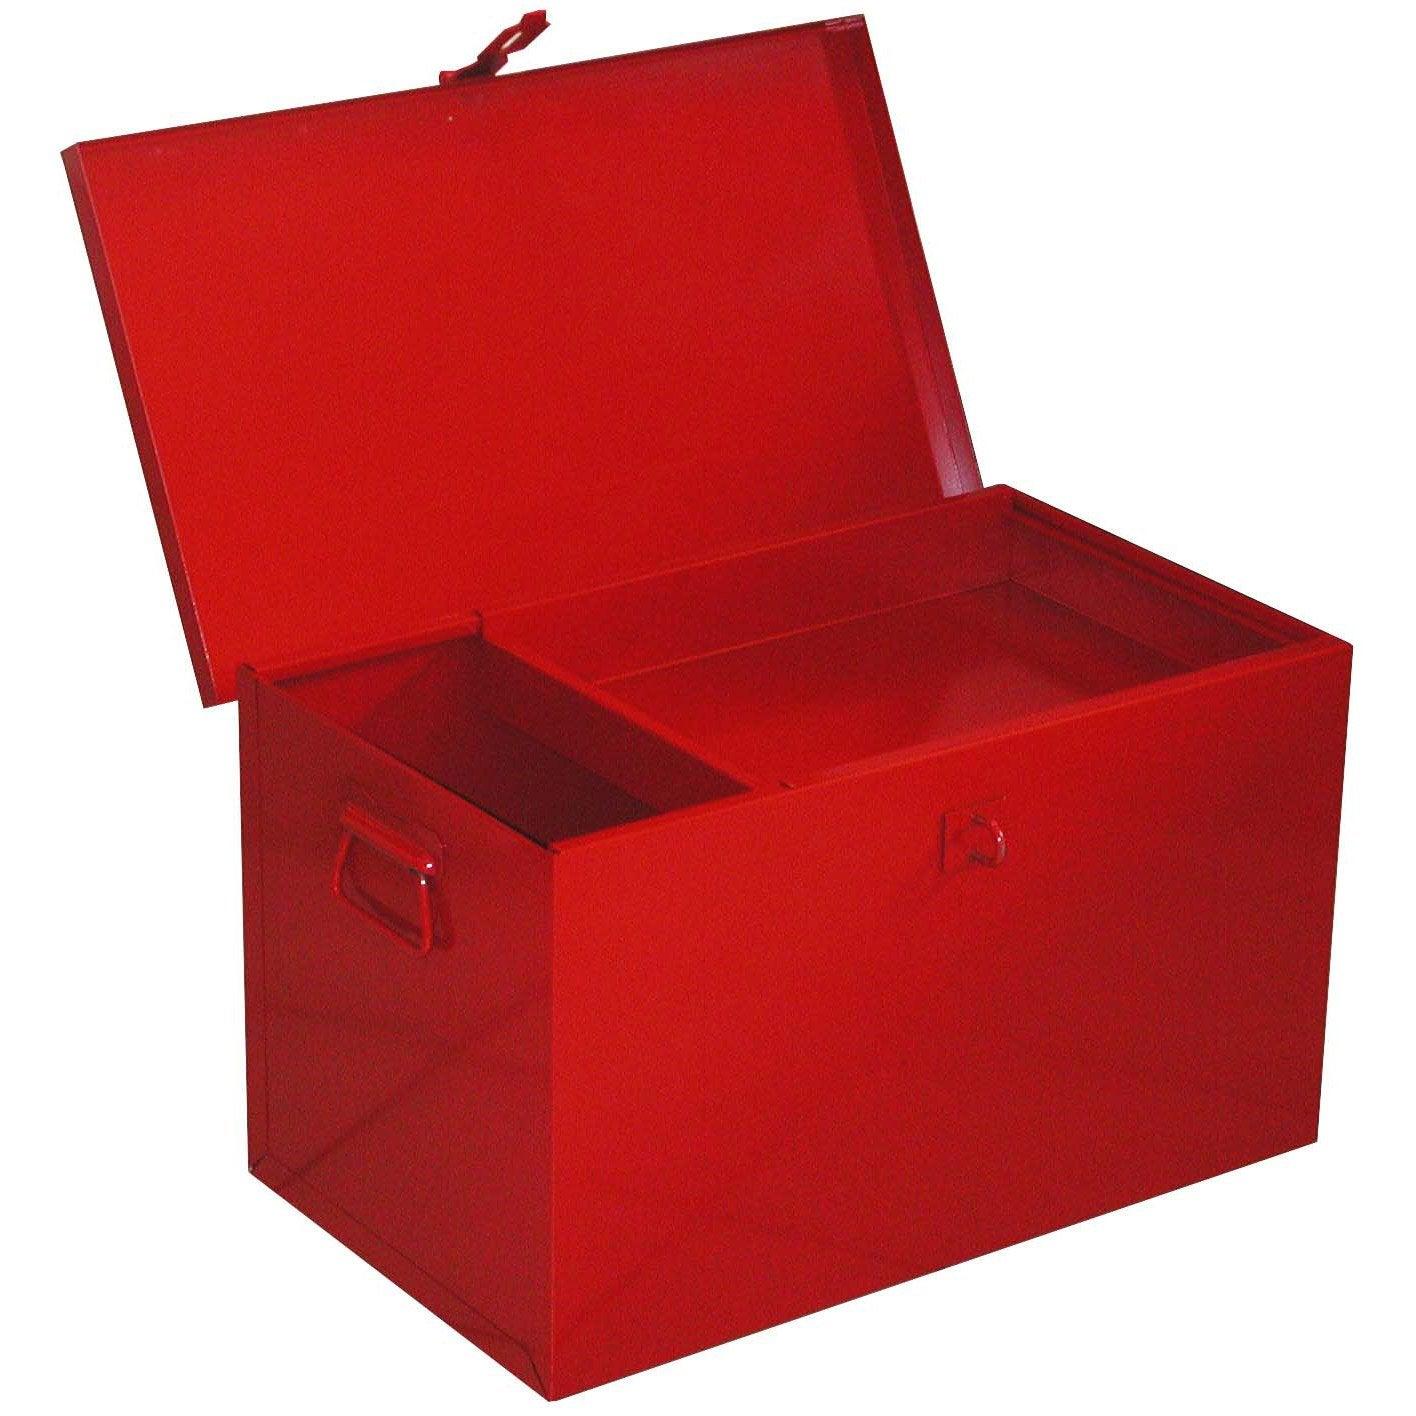 coffre chantier plateau amovible rouge leroy merlin. Black Bedroom Furniture Sets. Home Design Ideas